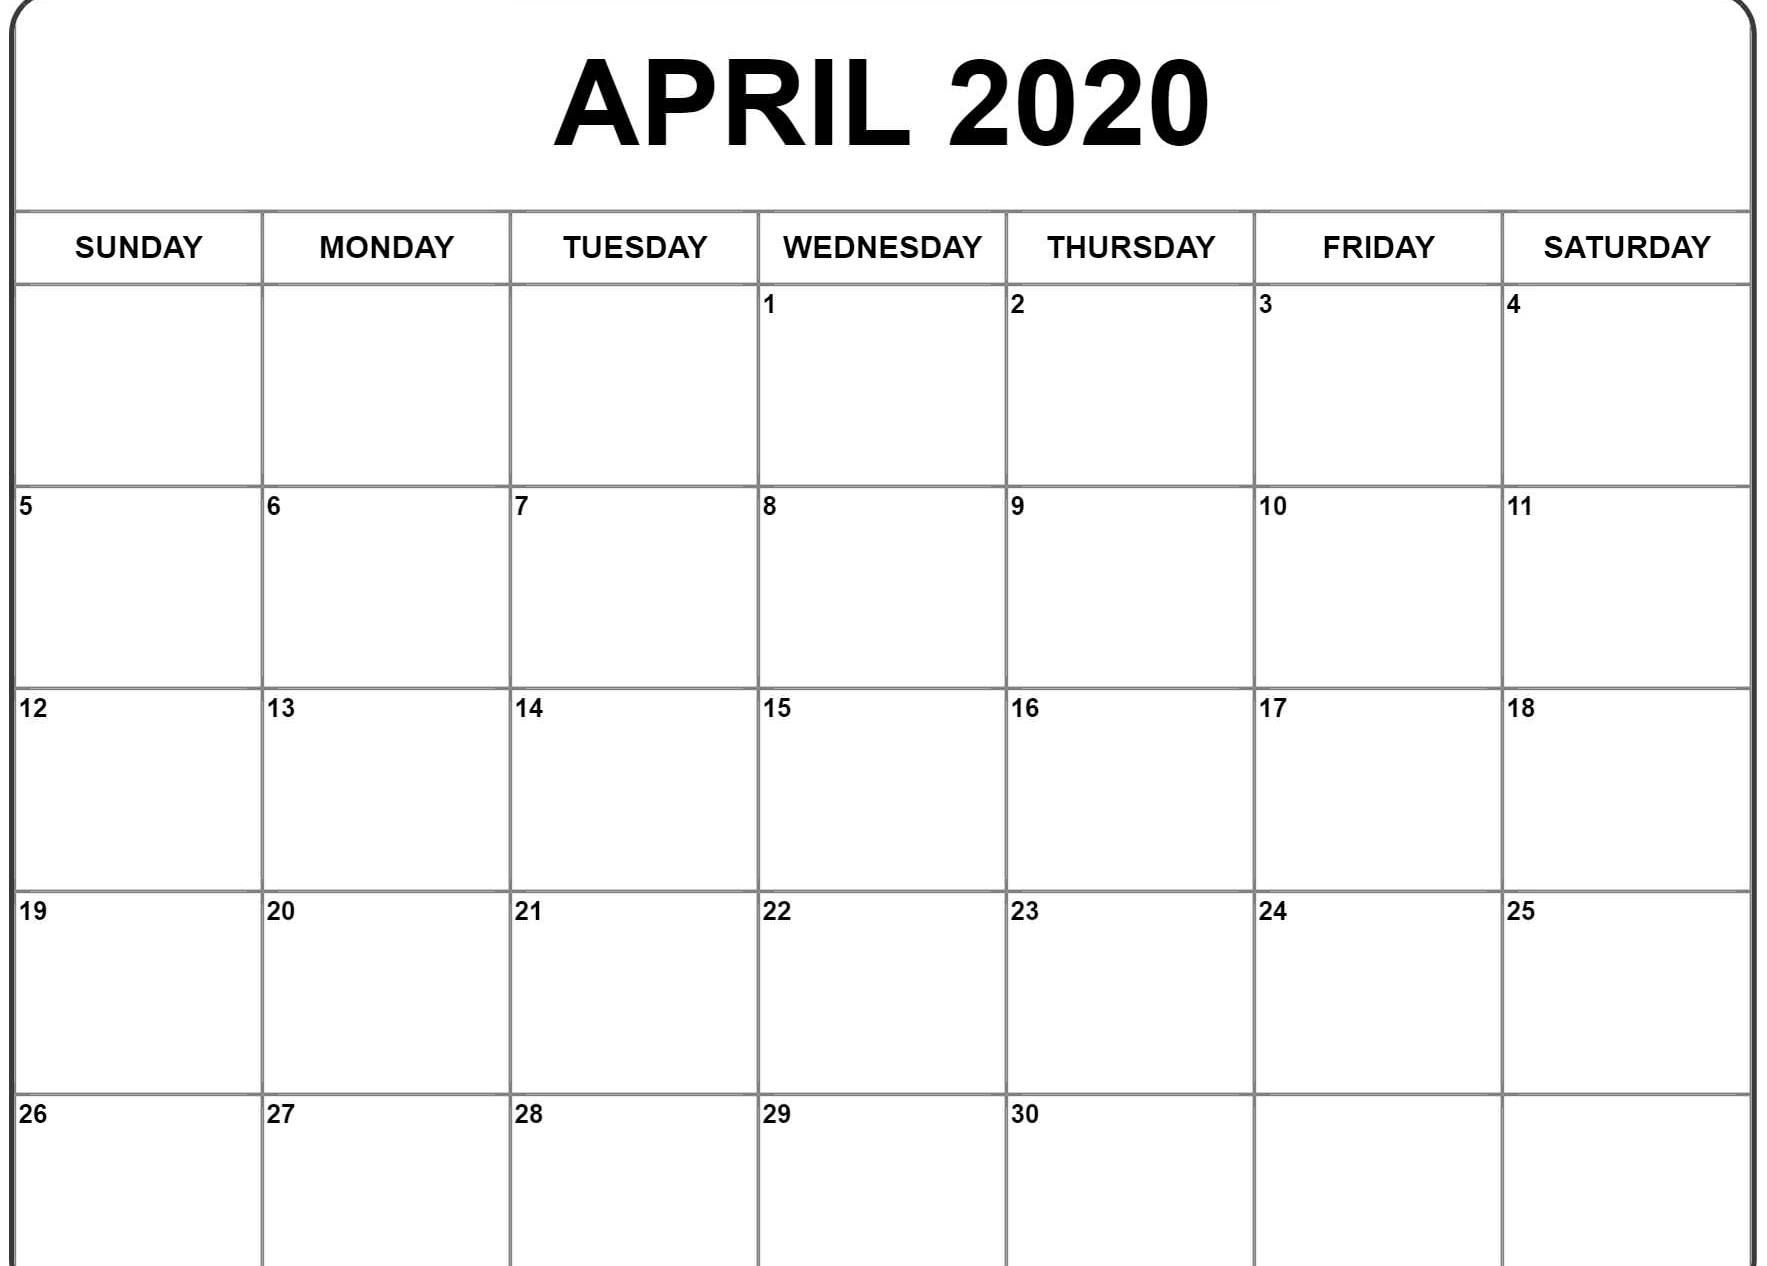 April 2020 Calendar Blank Template | July Calendar, Free